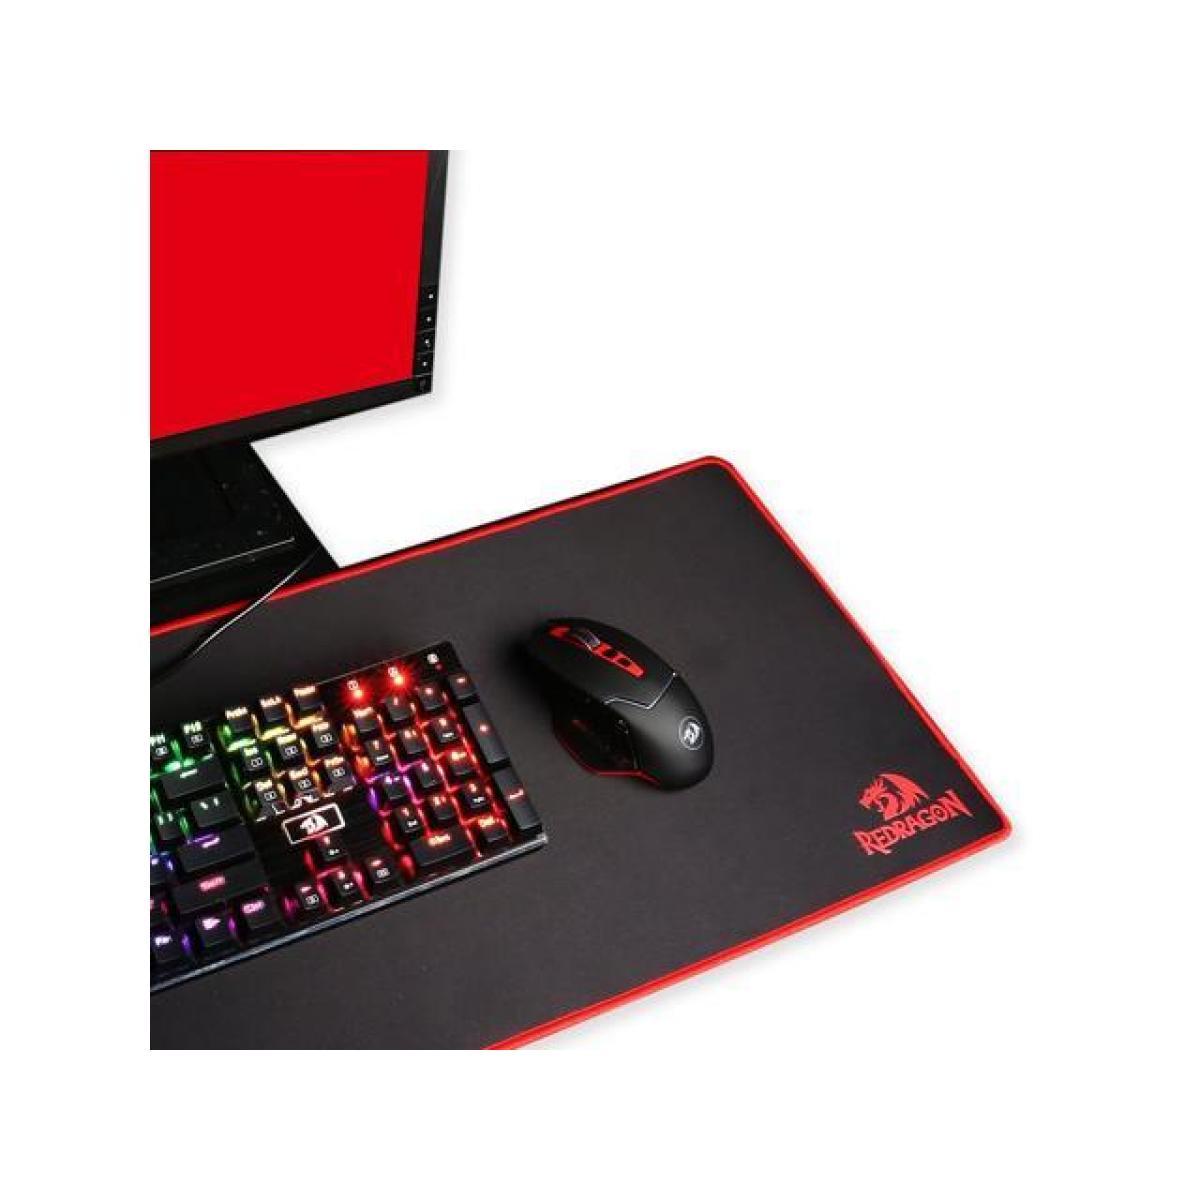 Redragon P003 Suzaku Huge Gaming Mouse Pad Mat P003